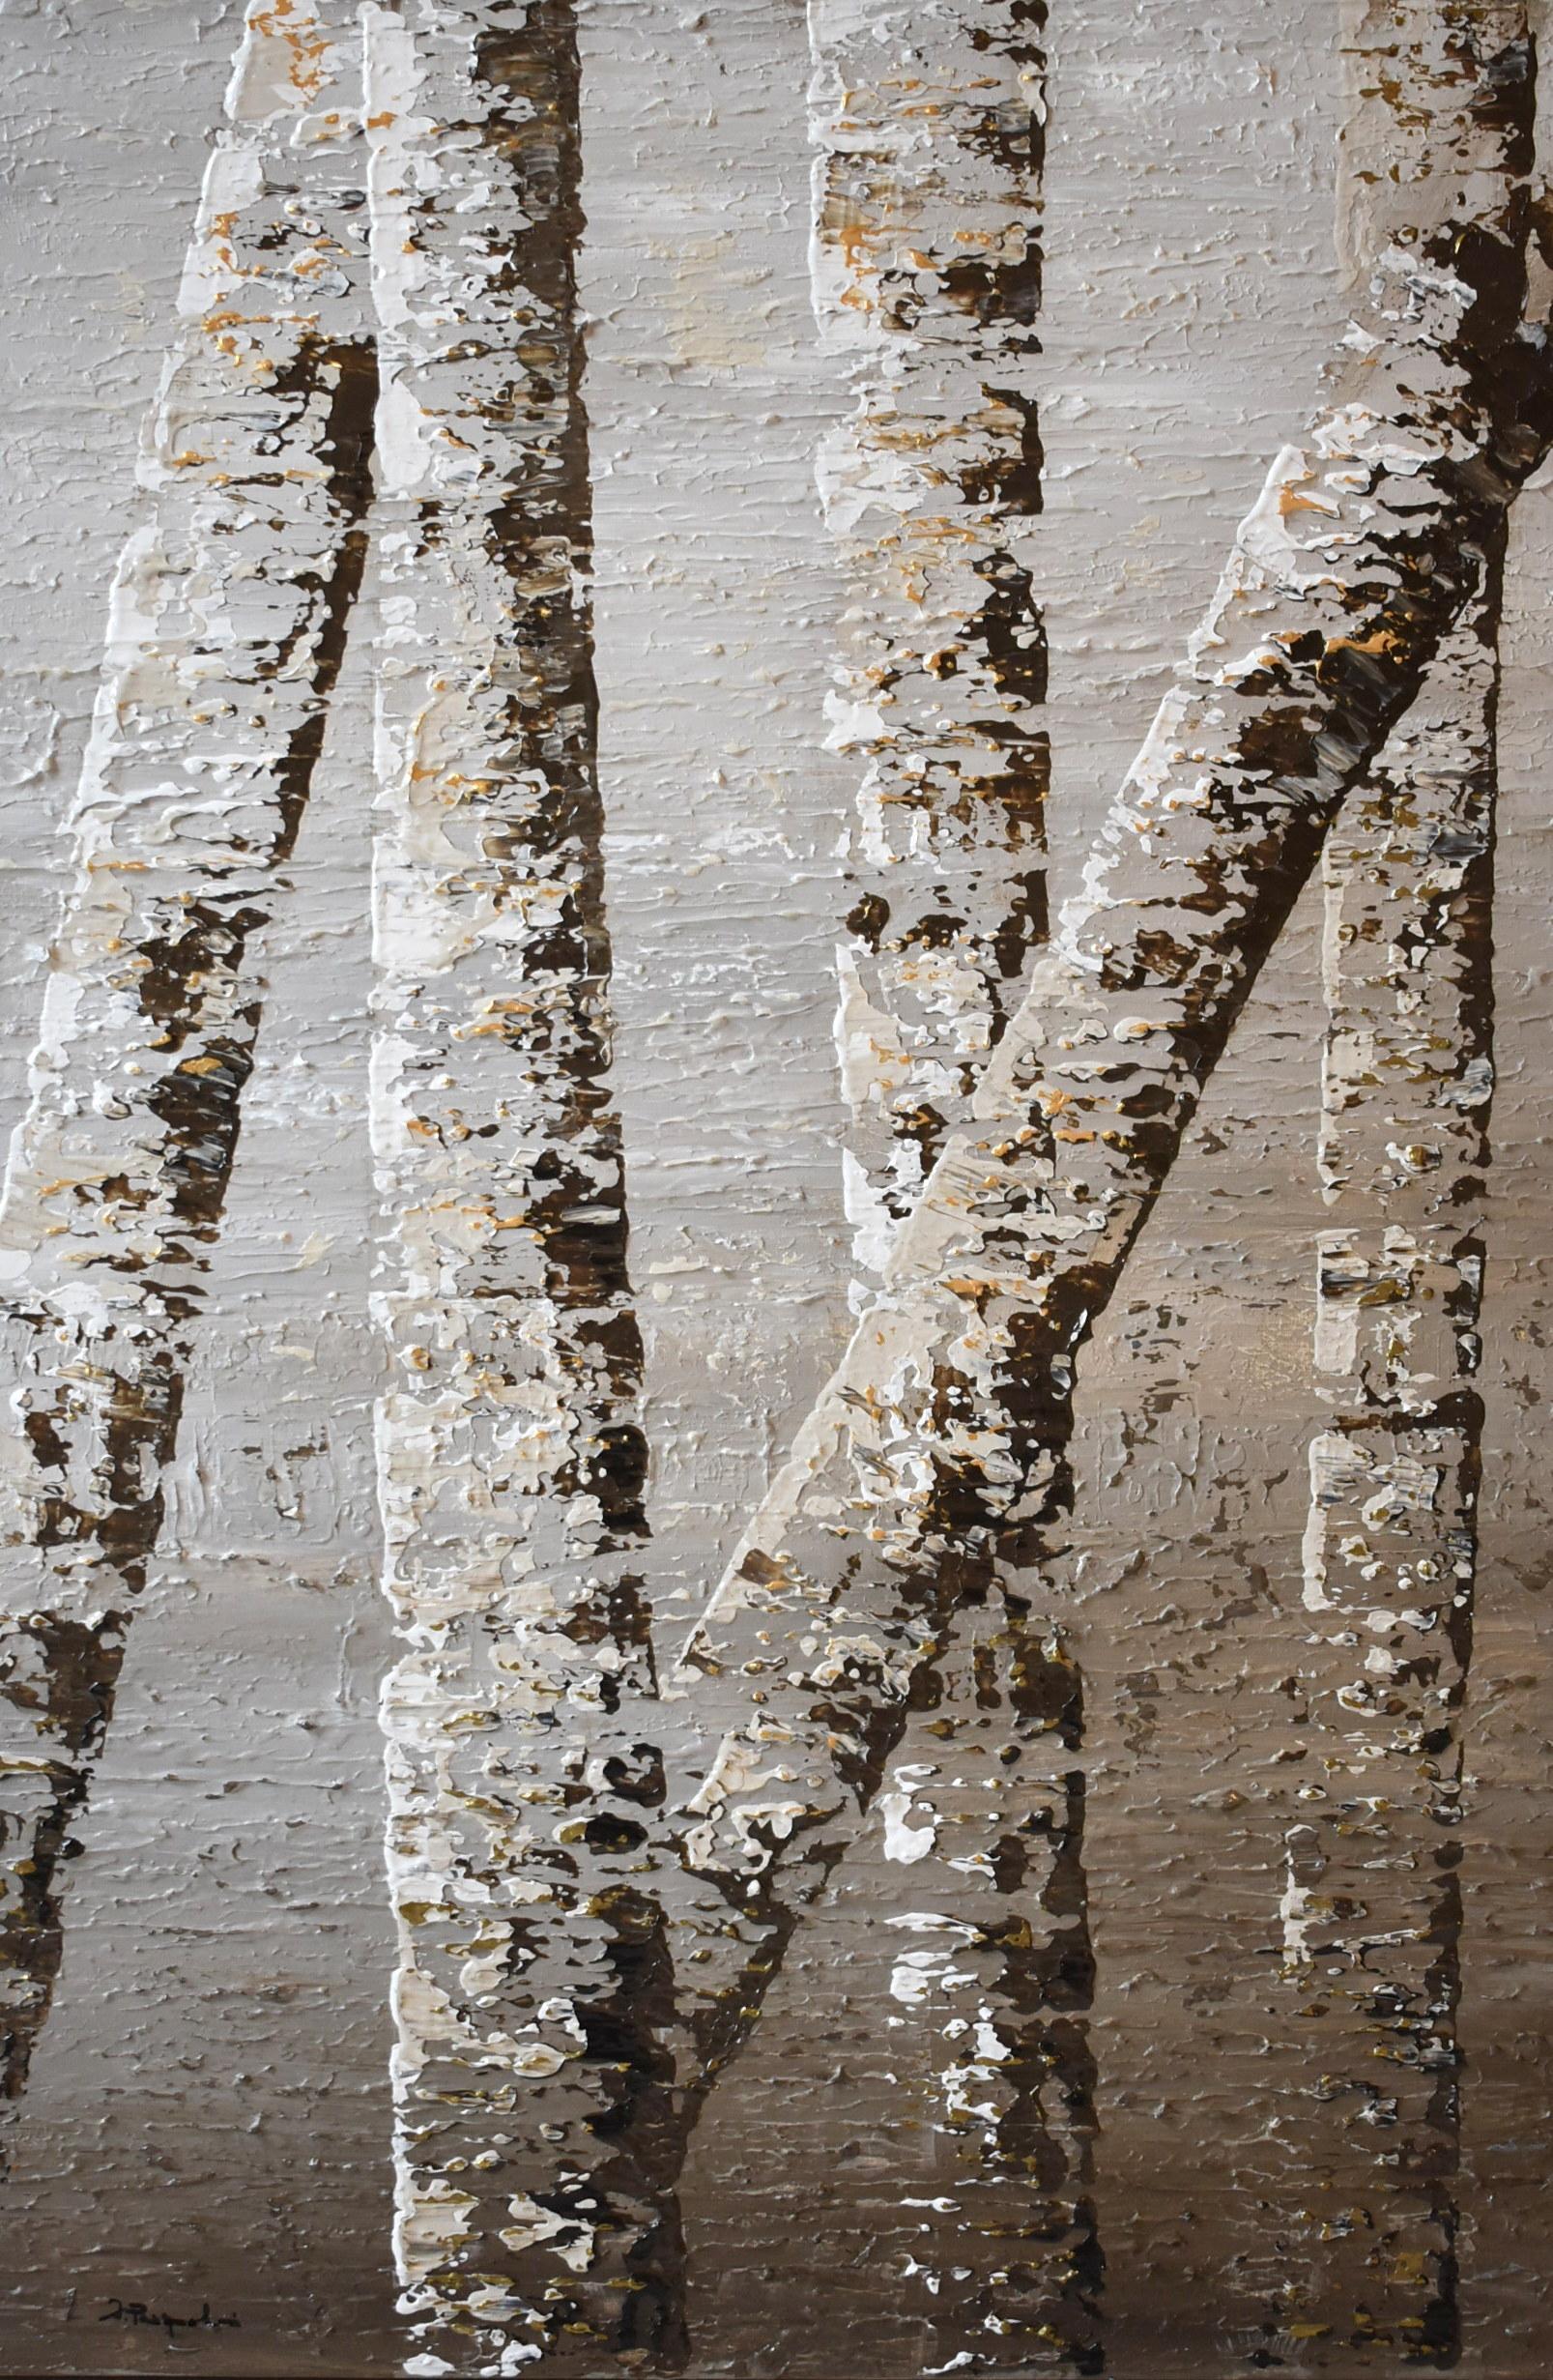 Birch Tree Reflection #6